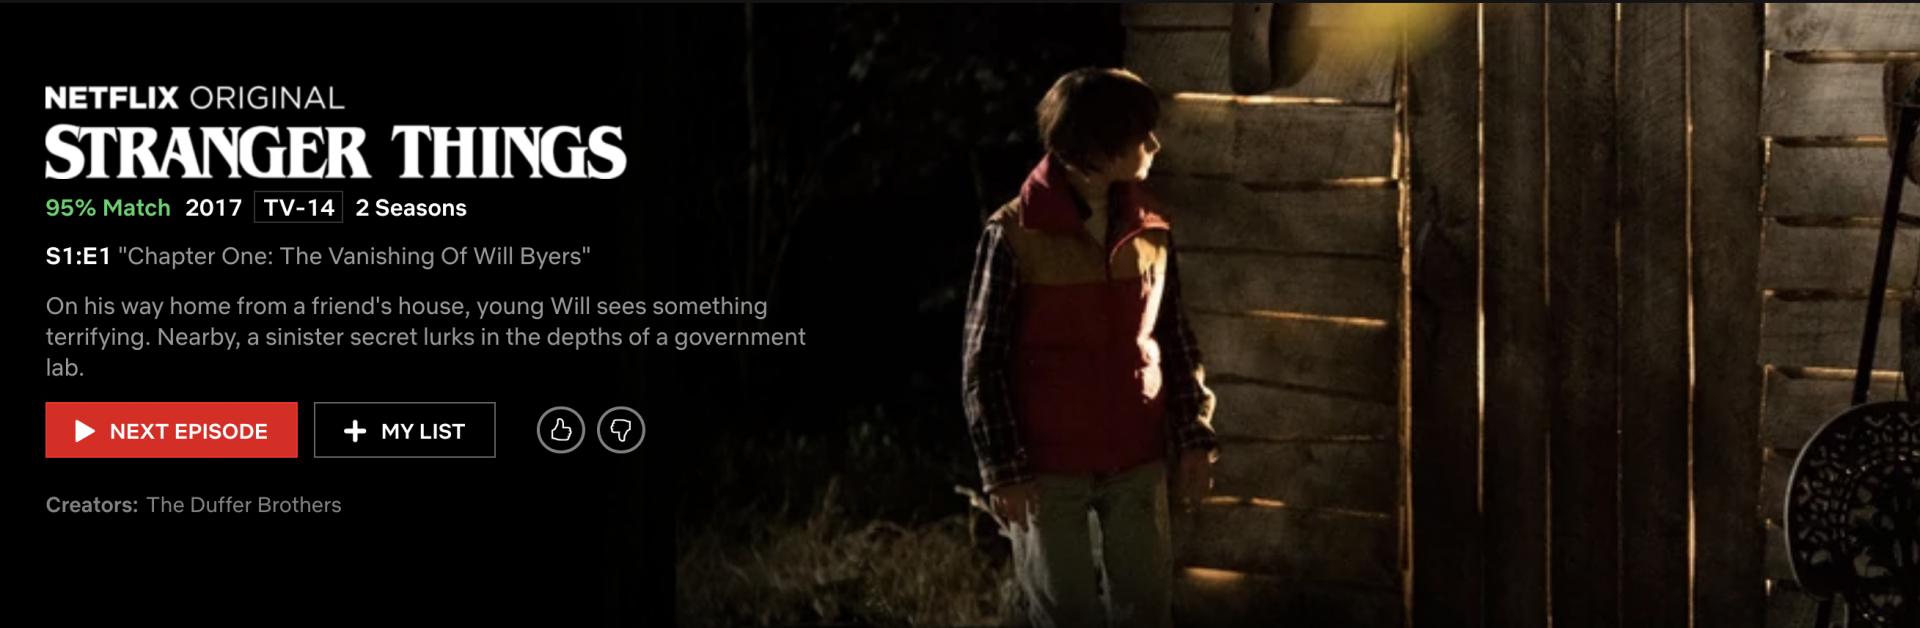 Stranger Things – Netflix Original